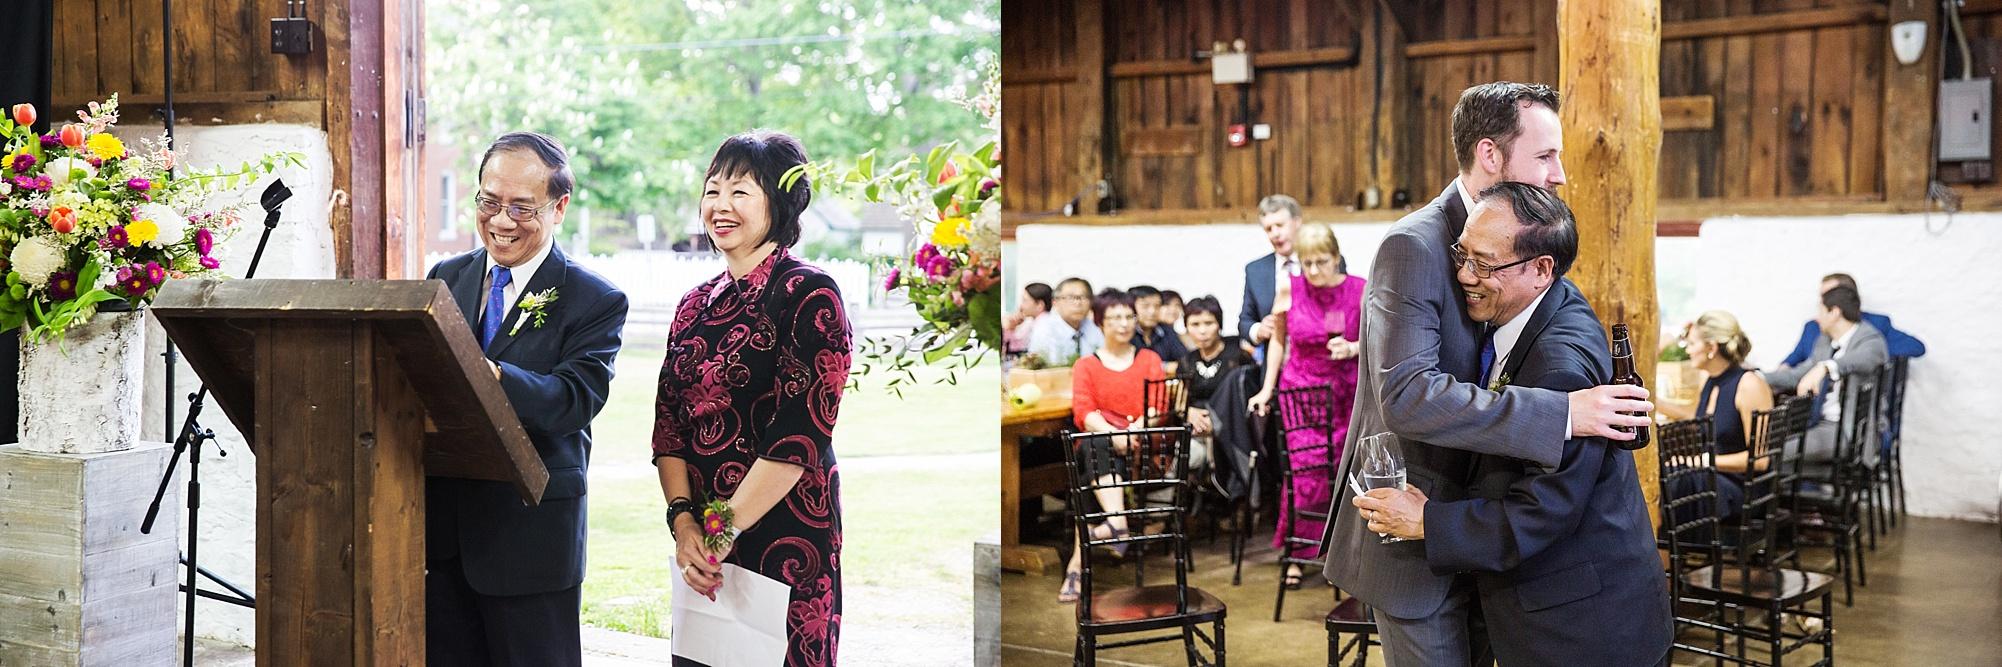 ballsfalls-wedding-photography_0100.jpg